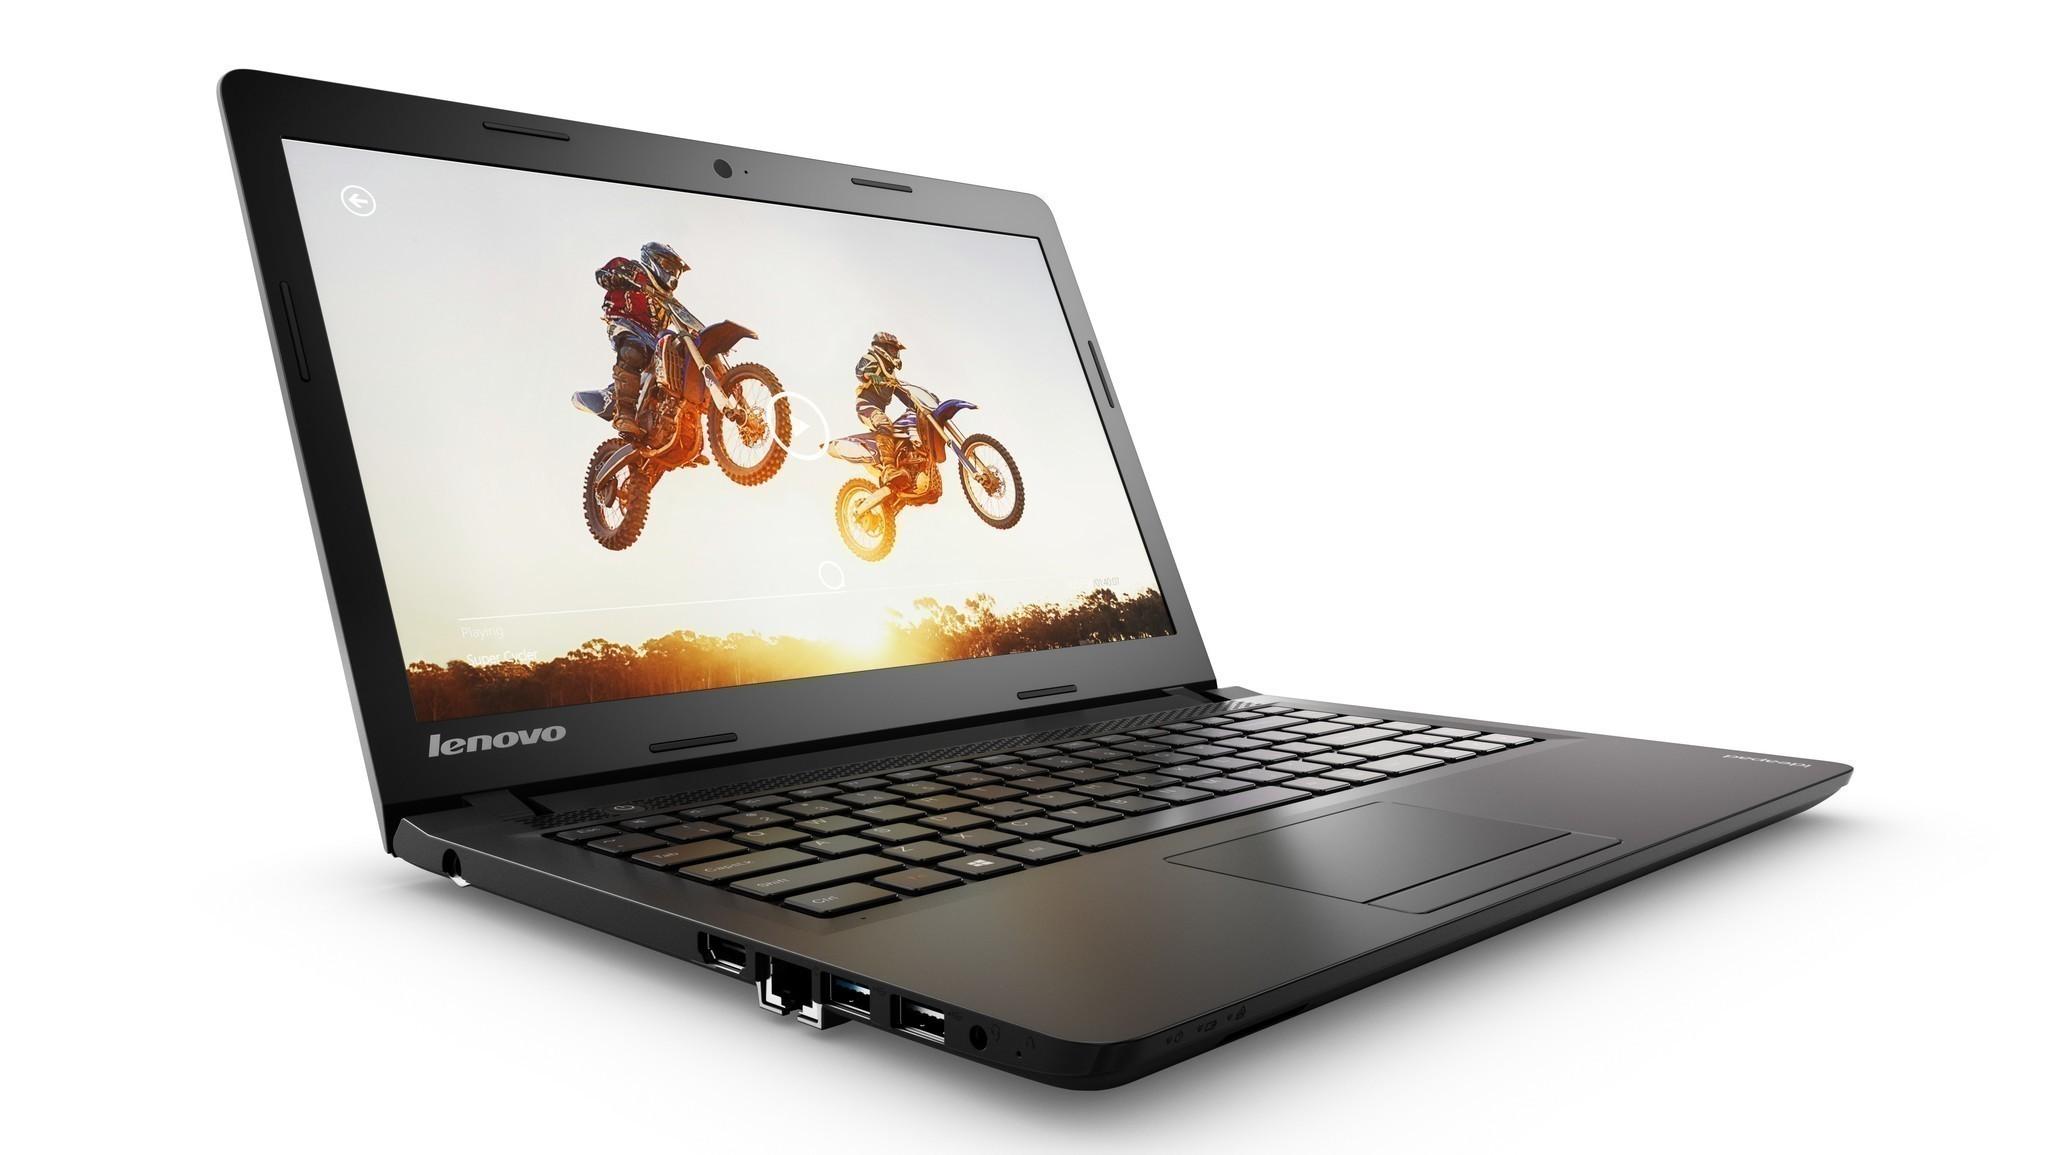 Lenovo V110 15ISK i3 6006U 8GB 128GB SSD HD